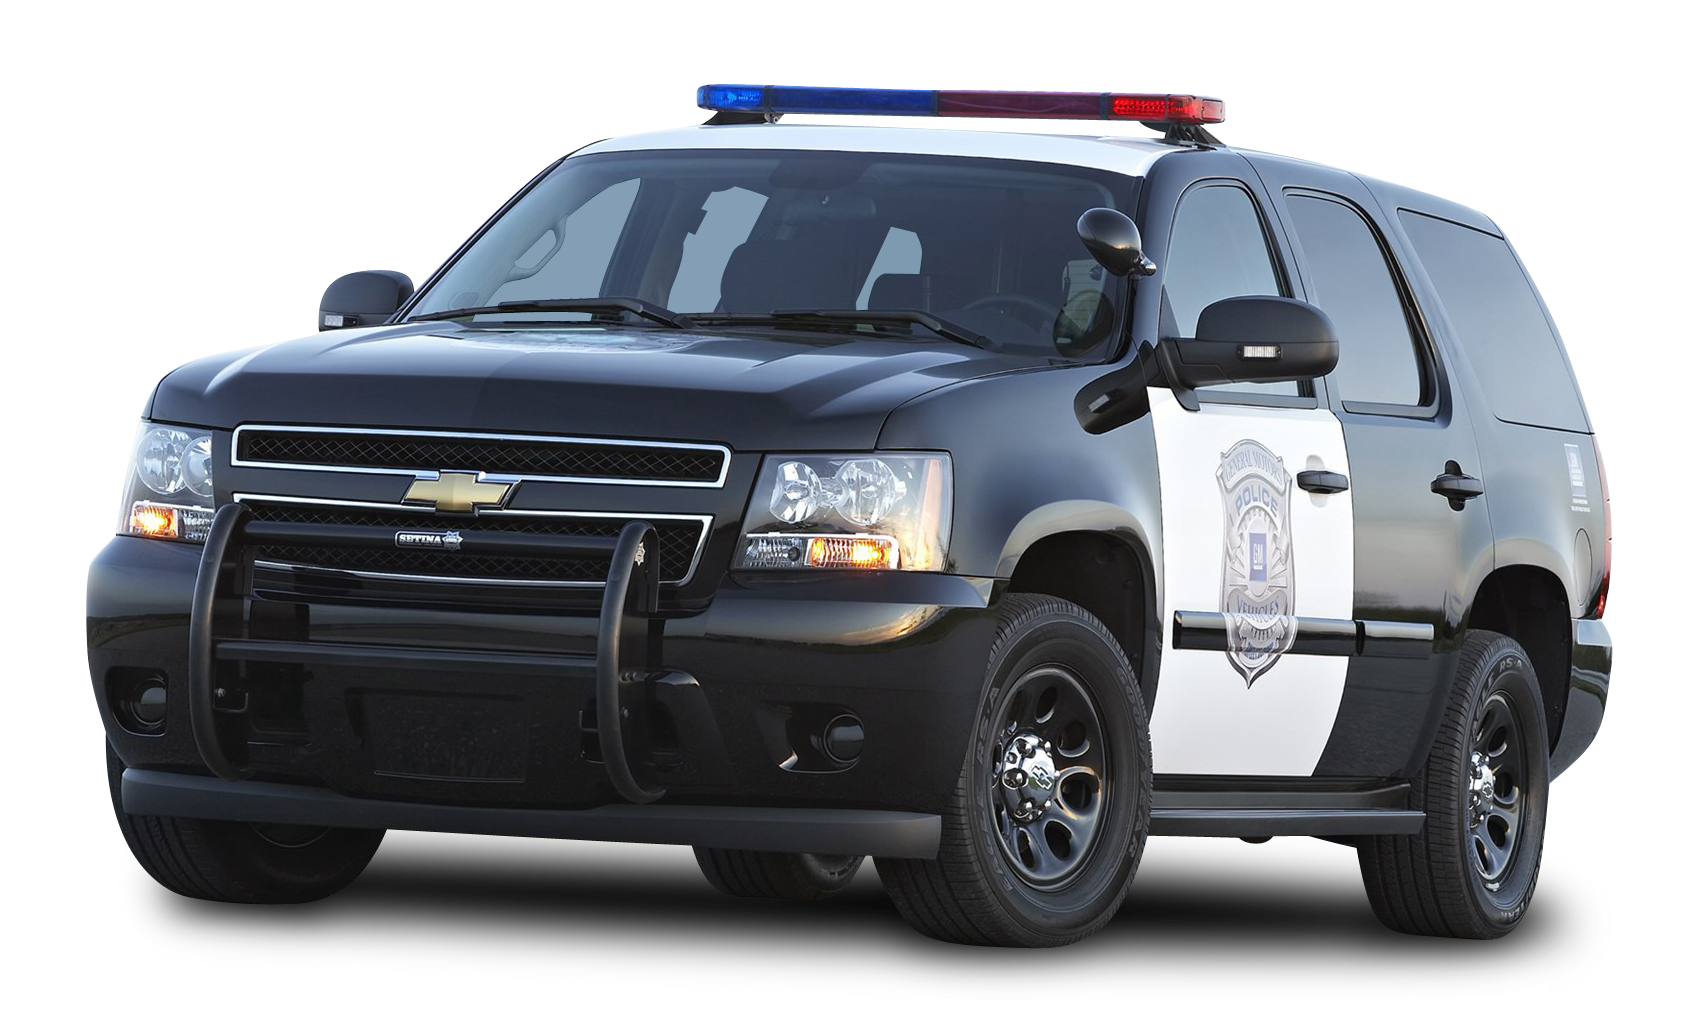 Police car clipart transparent background image free download Police Car PNG Image - PurePNG | Free transparent CC0 PNG Image Library image free download